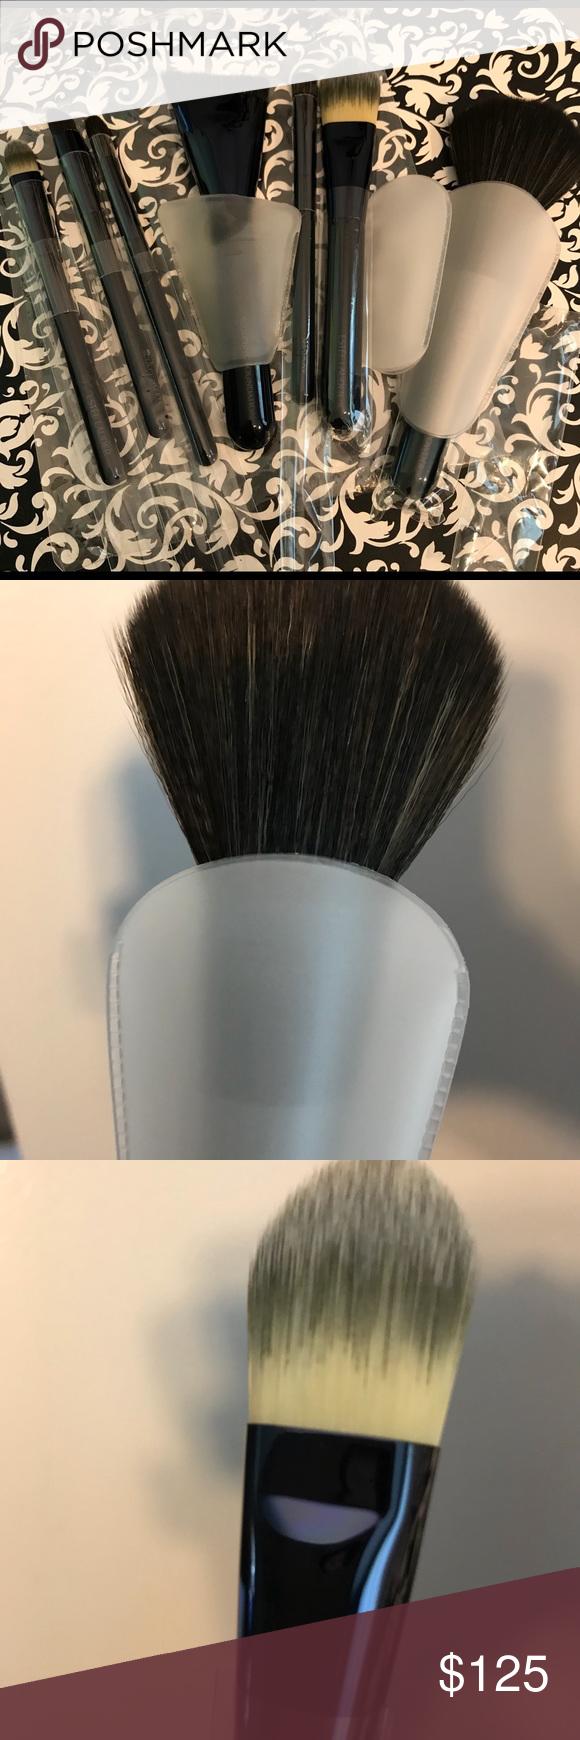 Estée Lauder 5 pc makeup brush set, new 1 powder brush 1